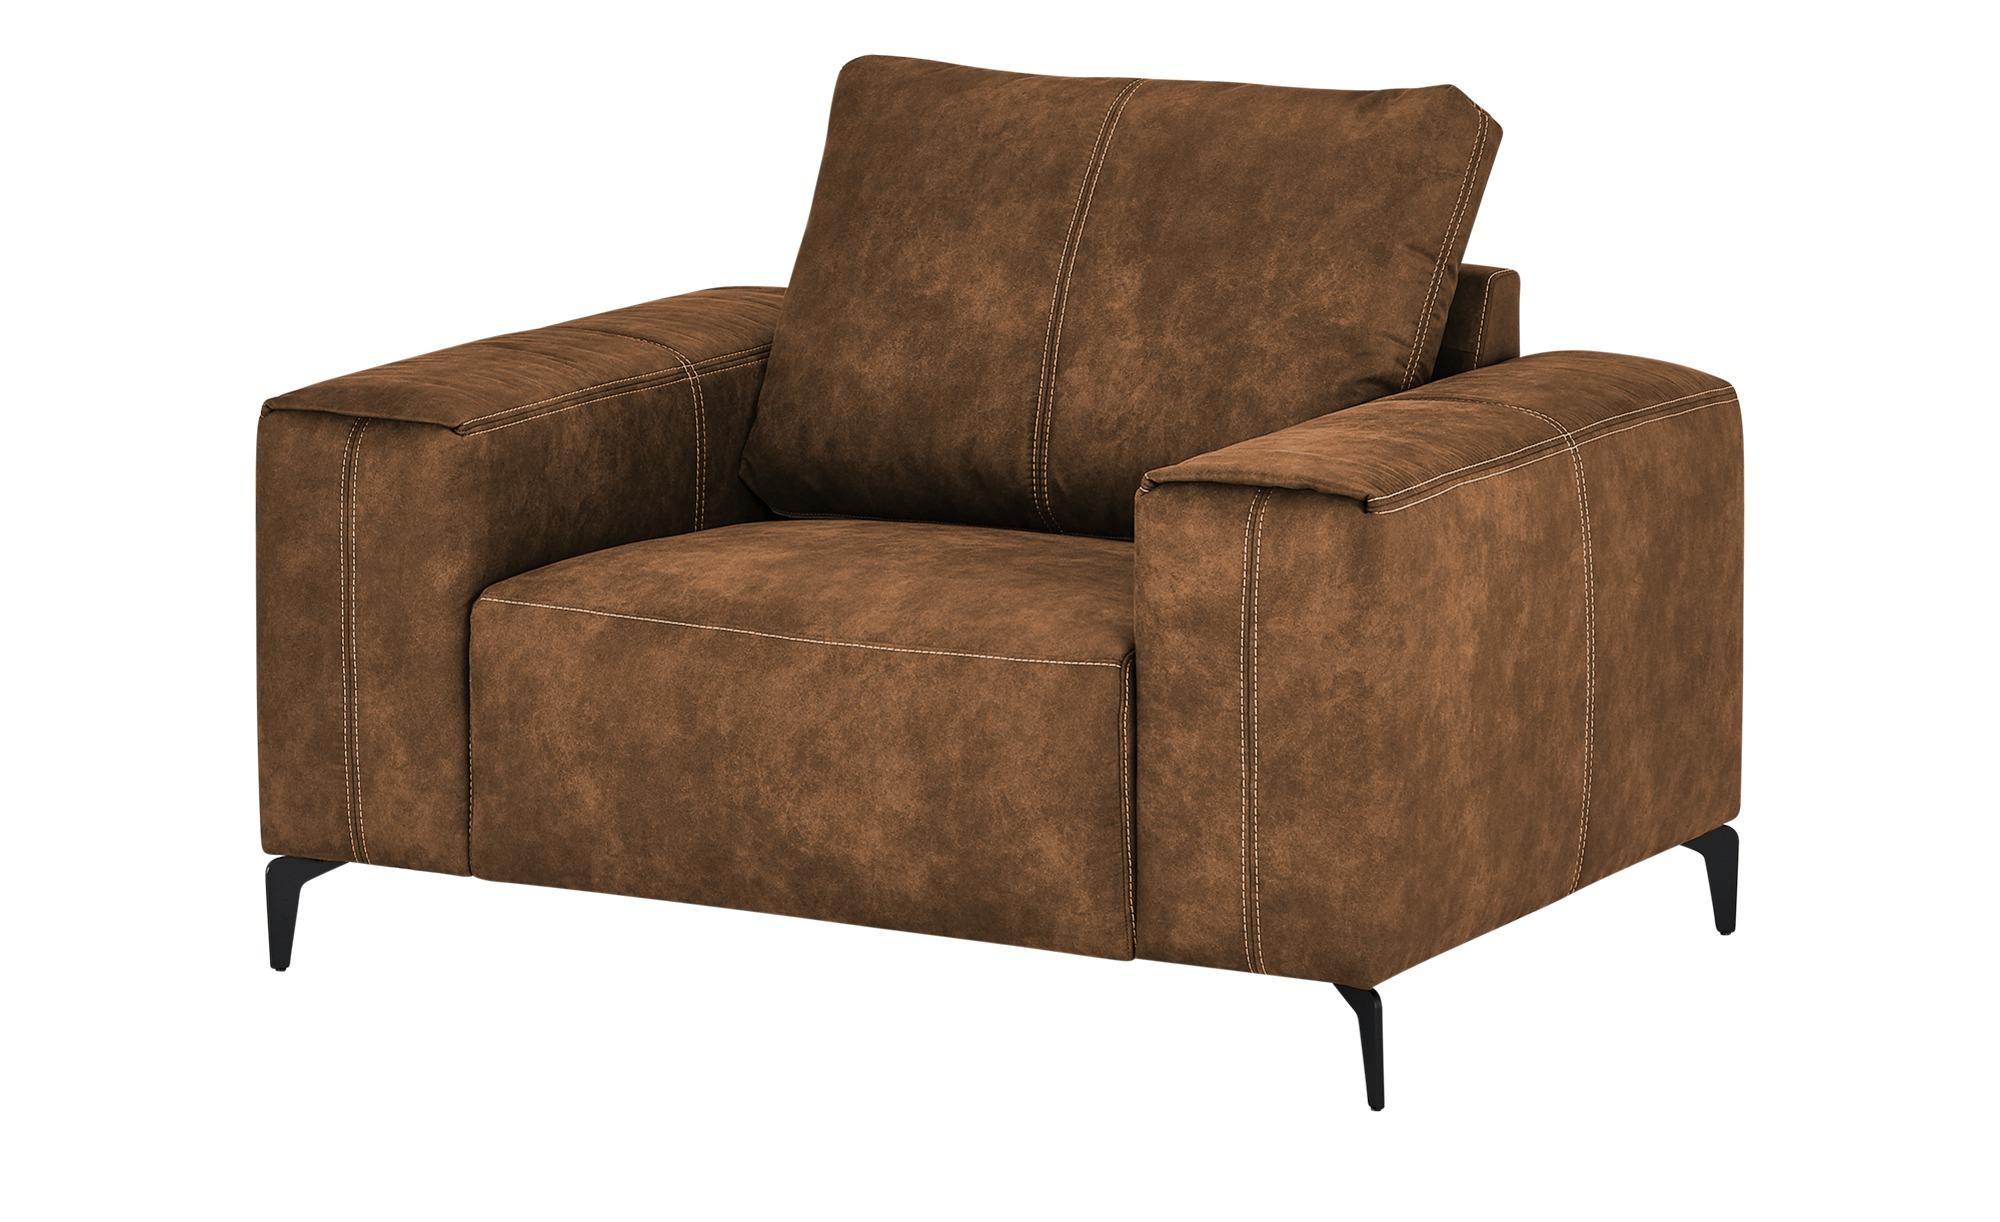 smart Sessel  Gabriela ¦ braun ¦ Maße (cm): B: 127 H: 90 T: 91 Polstermöbel > Sessel > Polstersessel - Höffner